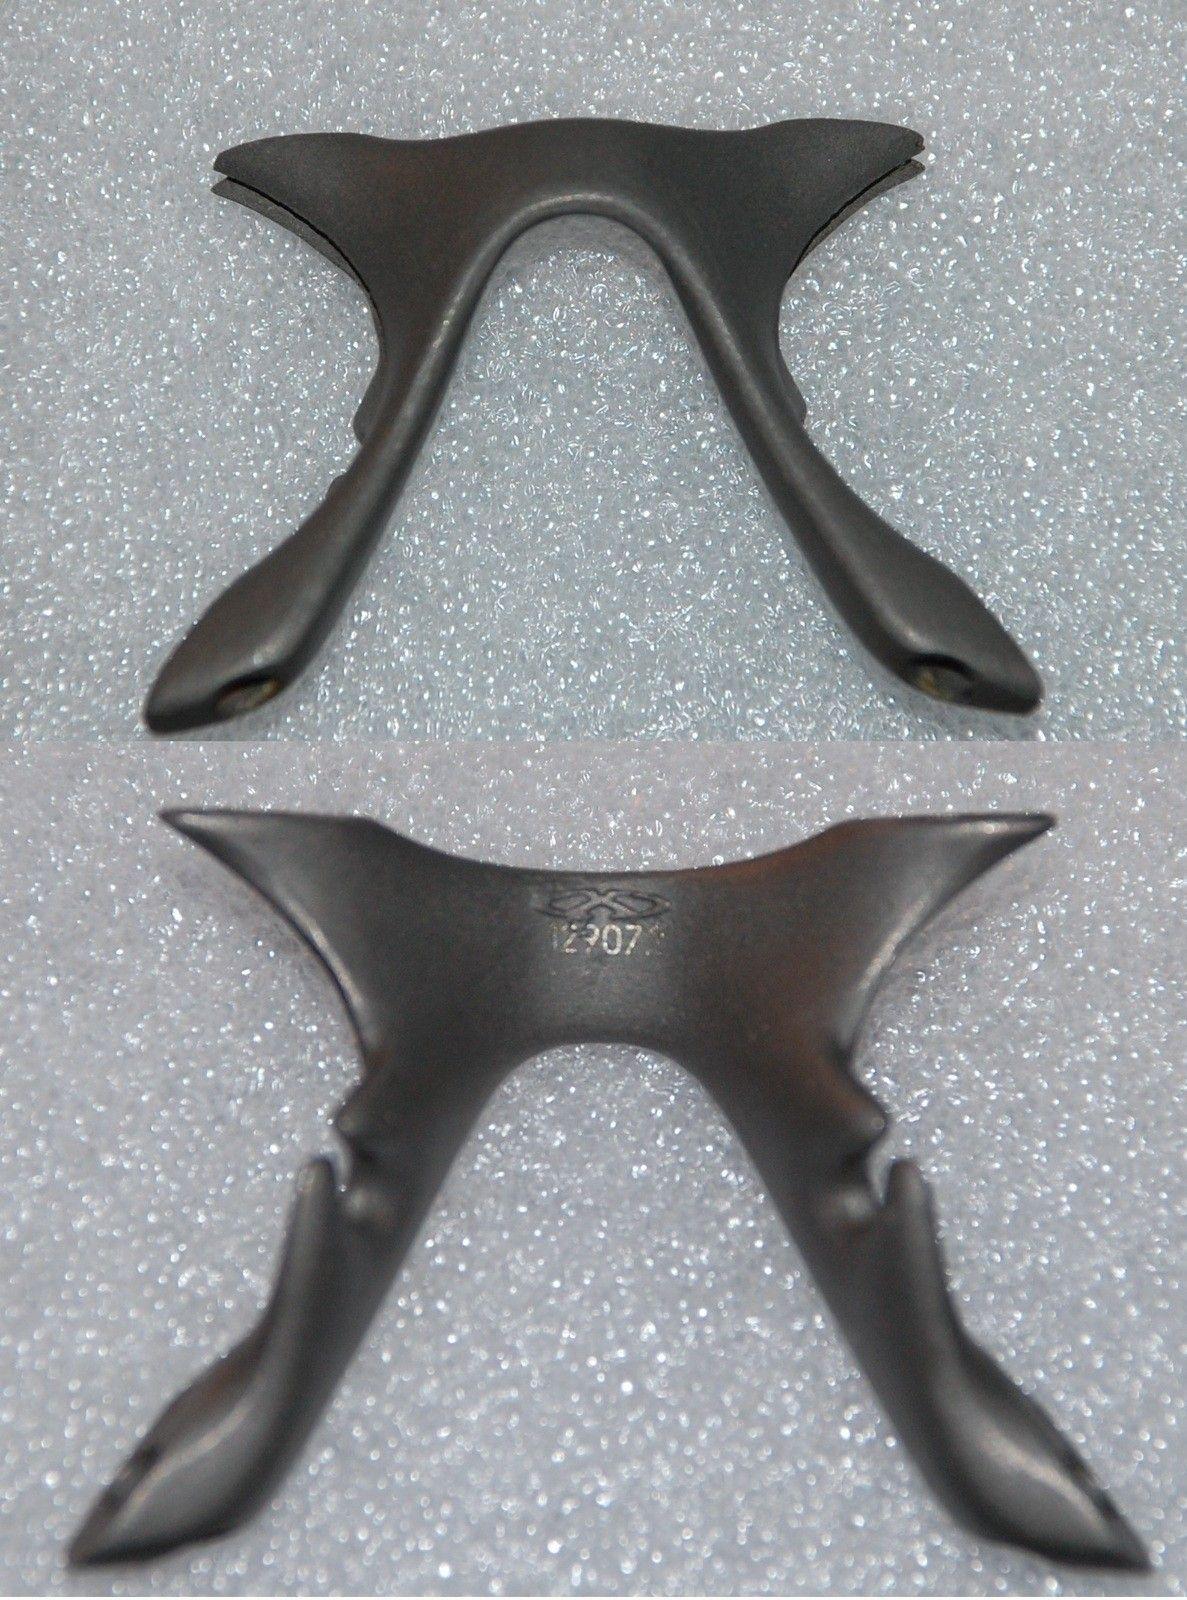 Penny-R1-Juliet-O-matter parts, stands, BOB keychain, Icon Claw Carabiner, Kevlar Wallet, display .. - R1 Nosebridge 2.jpg